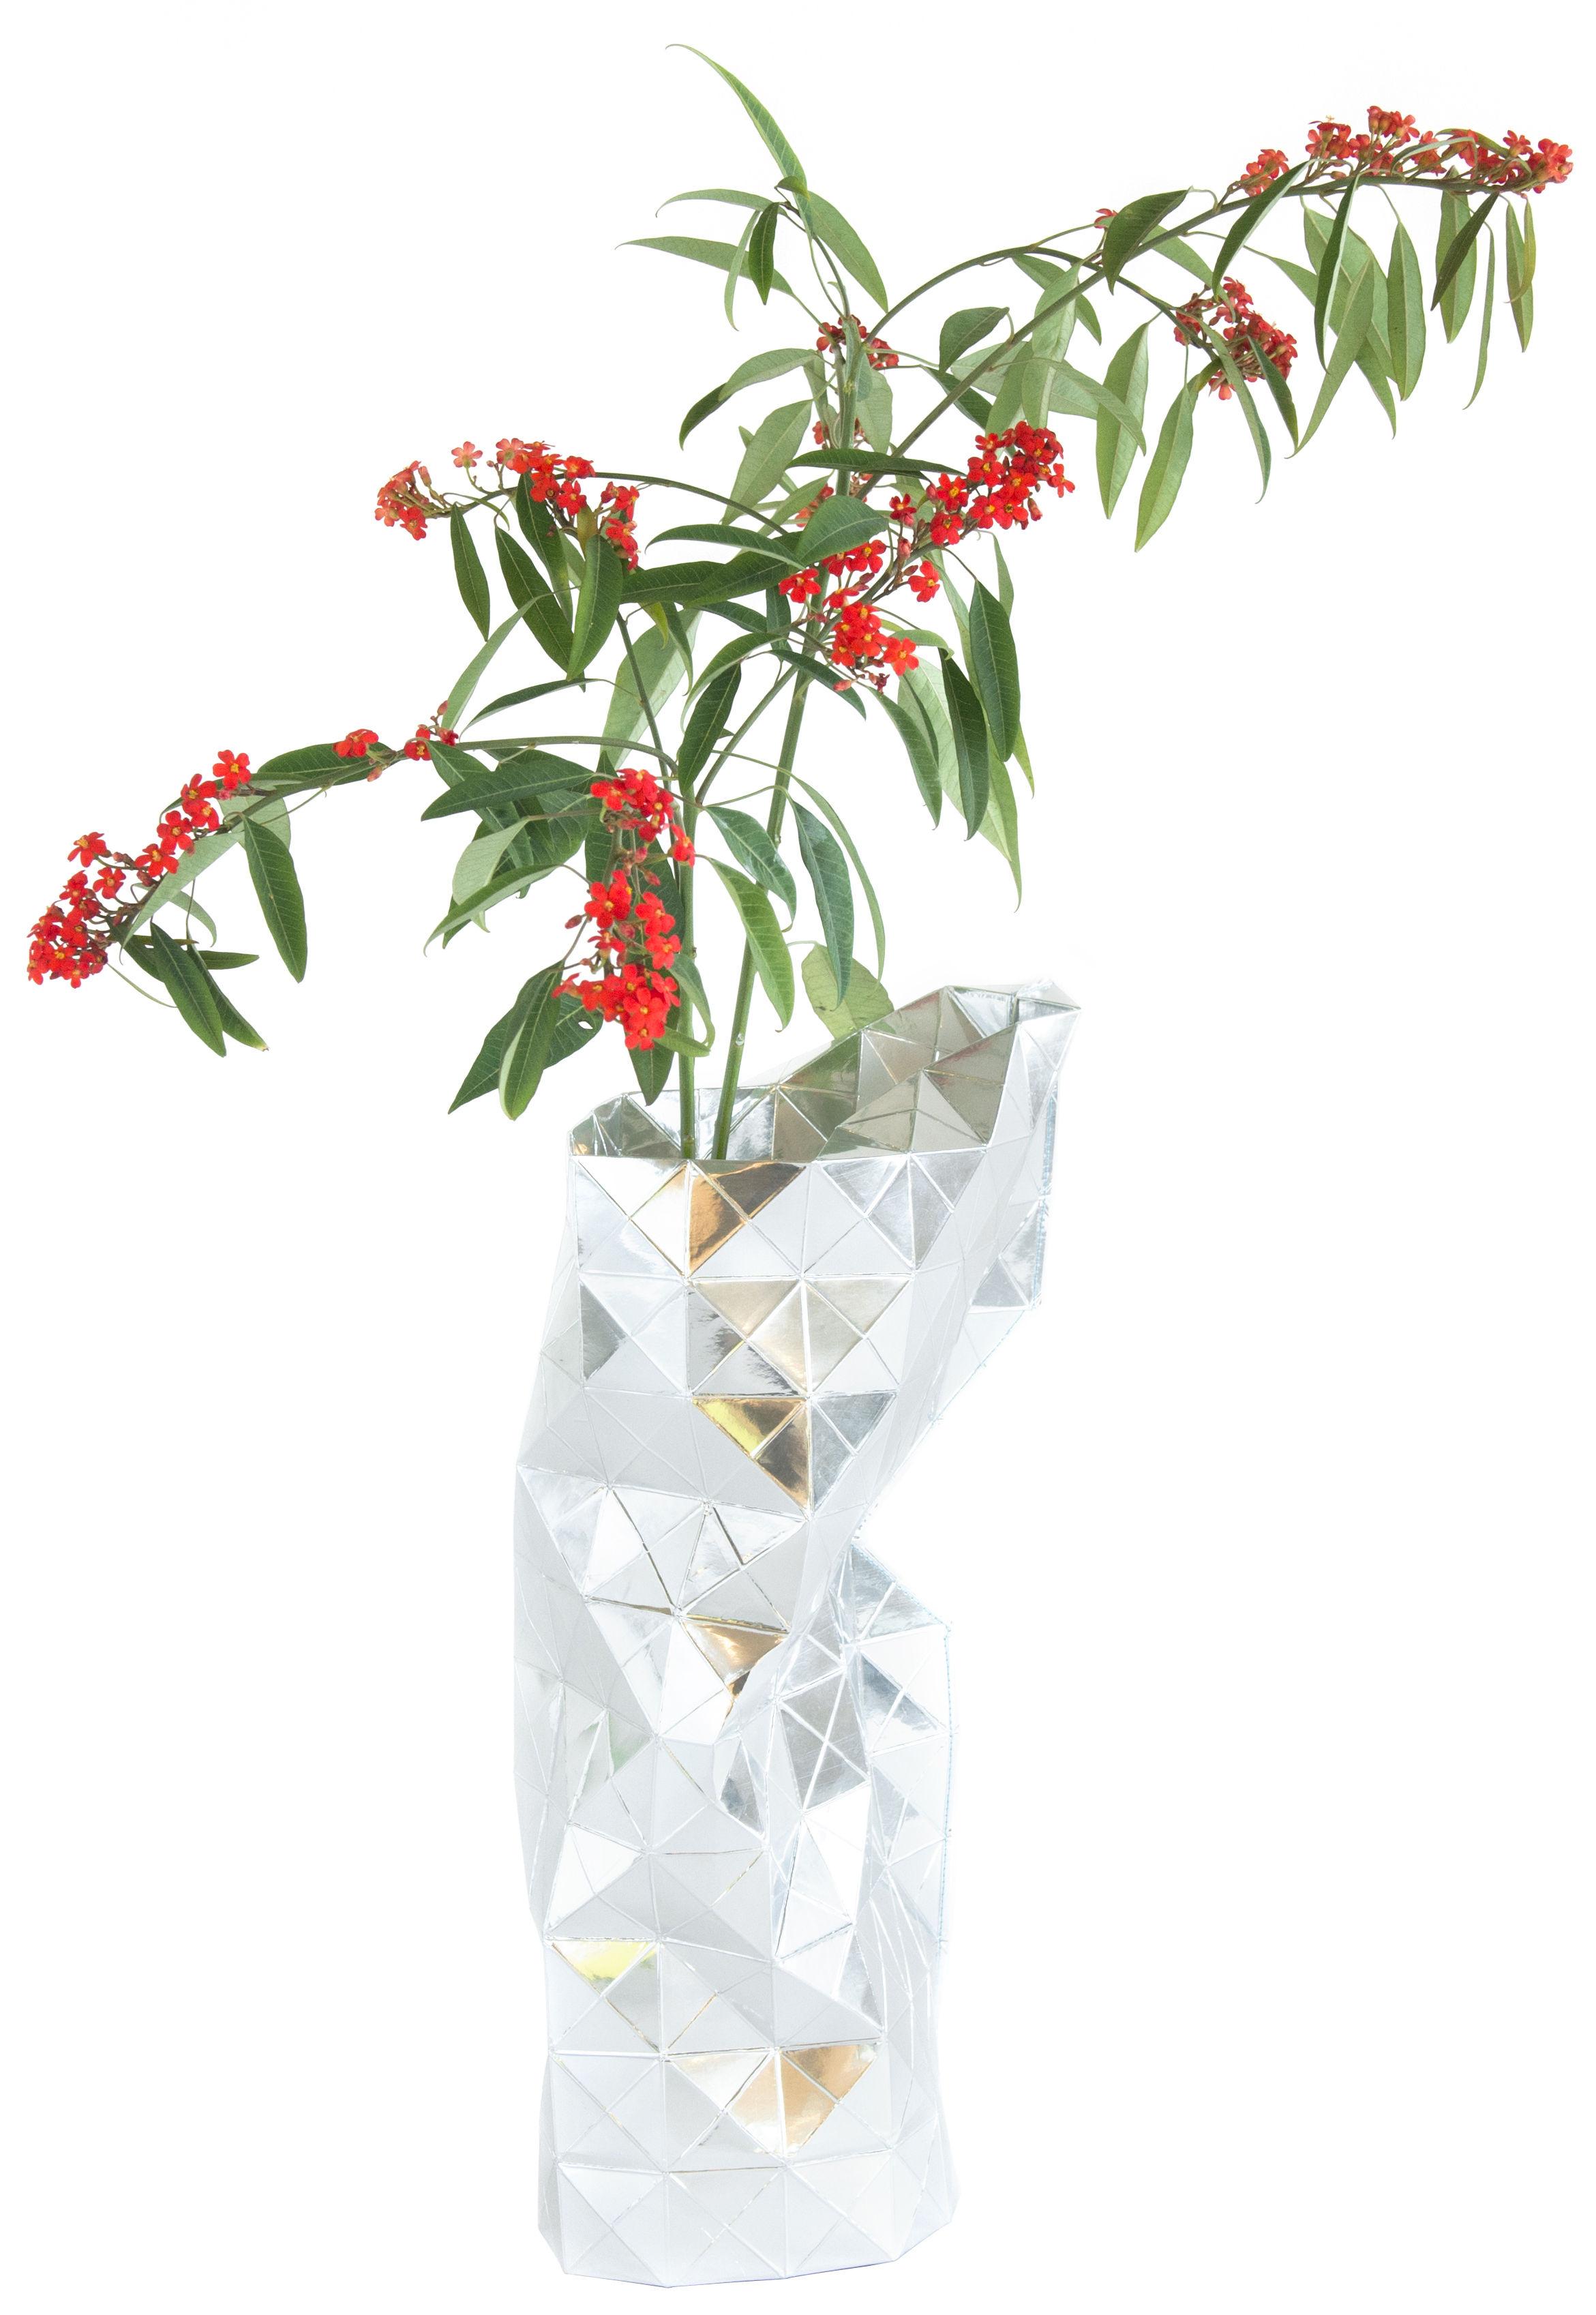 Interni - Vasi - Copri vaso Paper - / Ø 18  x H 42 cm di Pop Corn - Cromato - Papier pelliculé